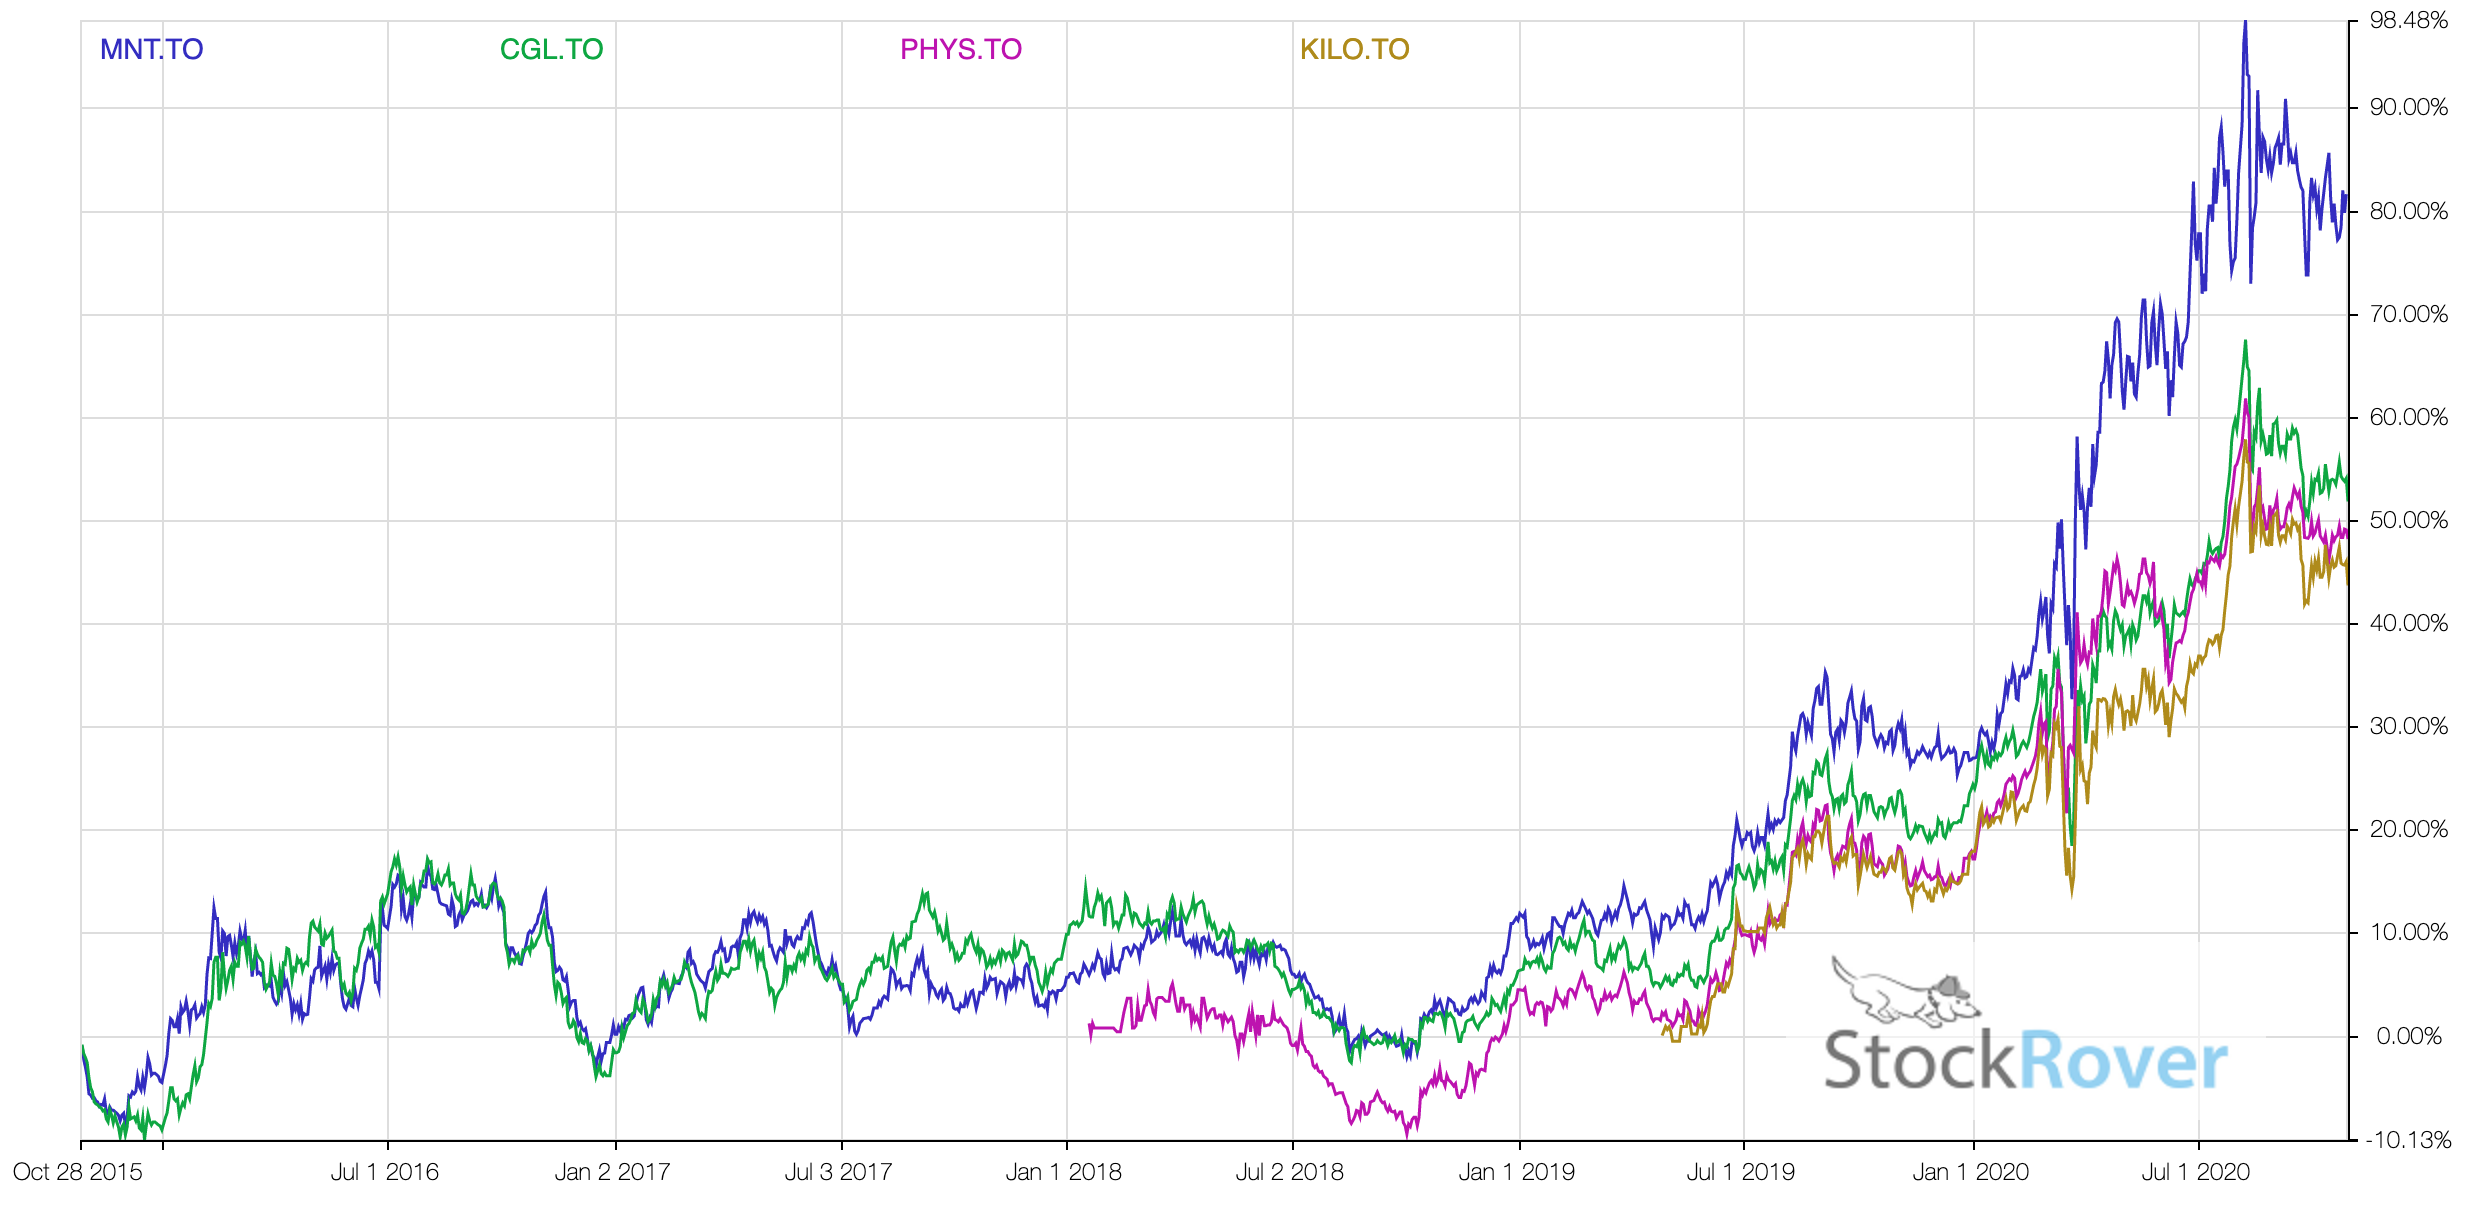 Gold Bullions ETF comparison